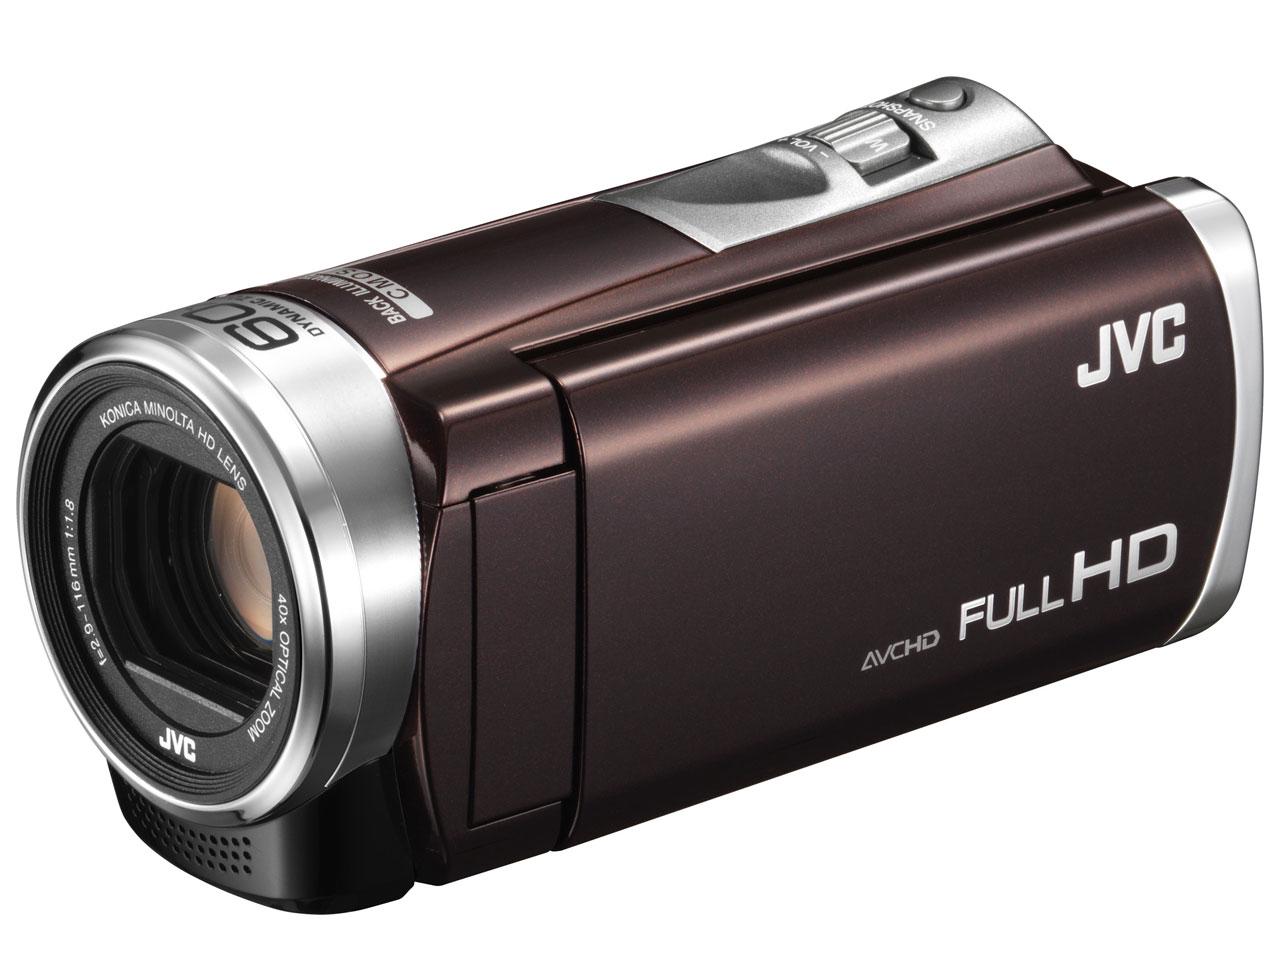 JVC ビデオカメラ Everio 32GB ダイナミック60倍/光学40倍ズーム GZ-E400-T (ブラウン) 【新品】【送料無料】